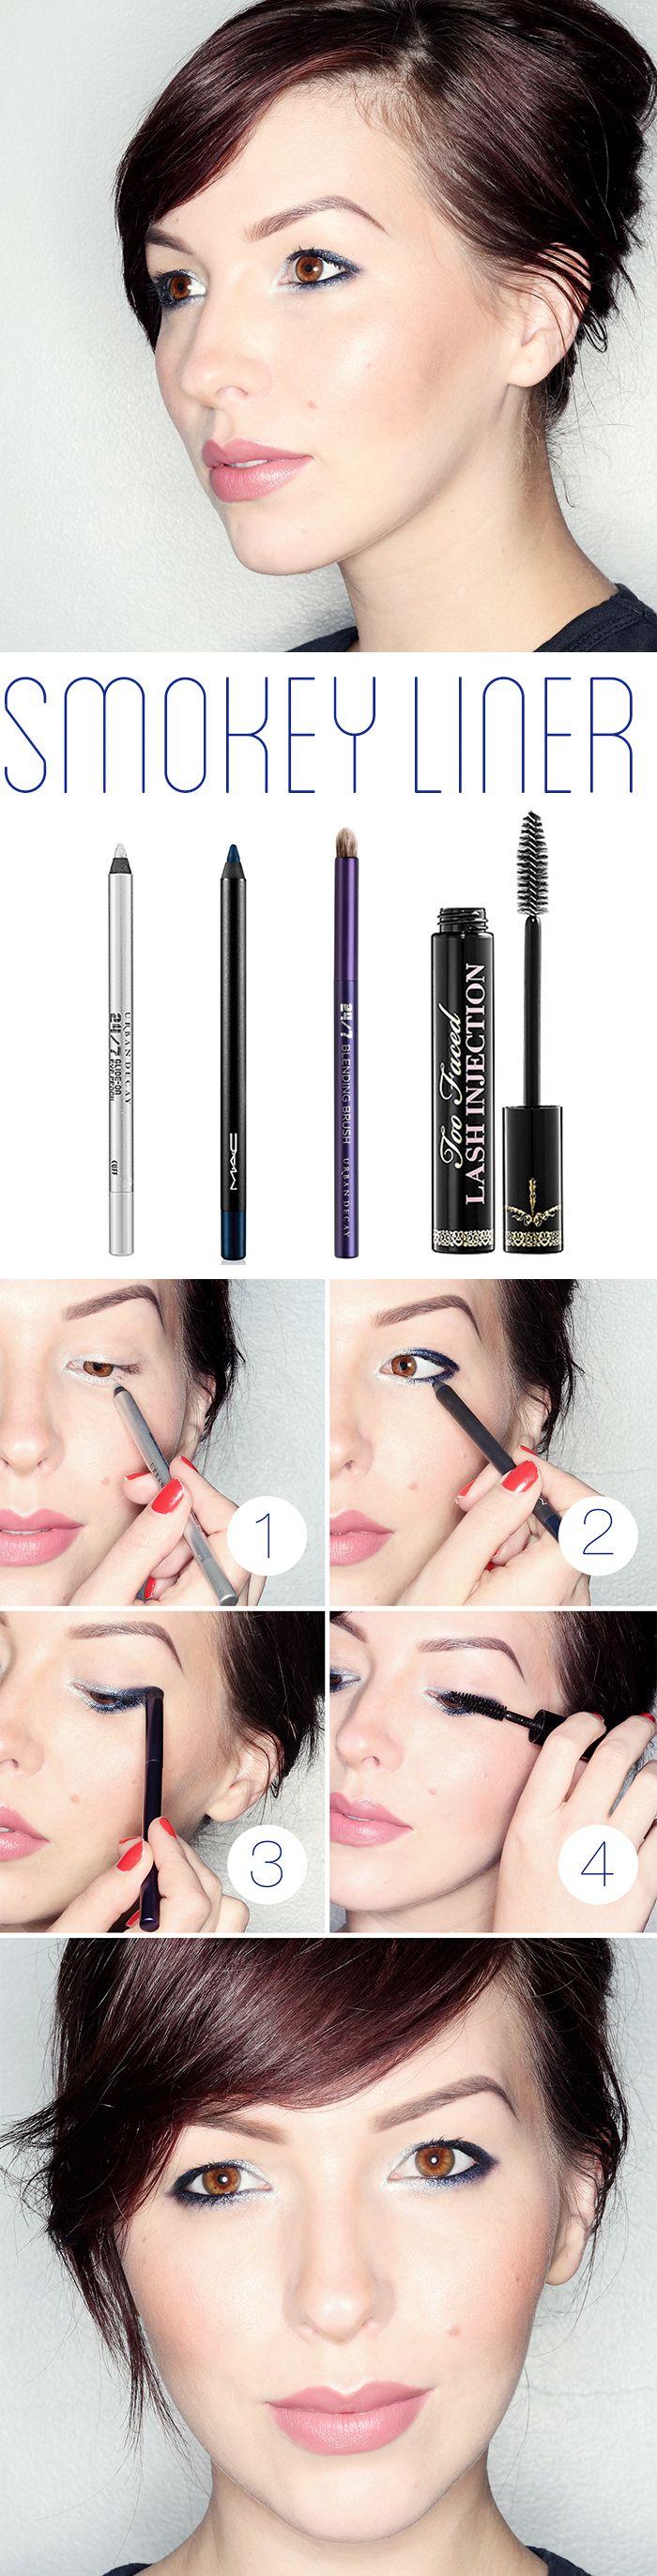 Makeup Monday: Simple Smokey Liner Tutorial